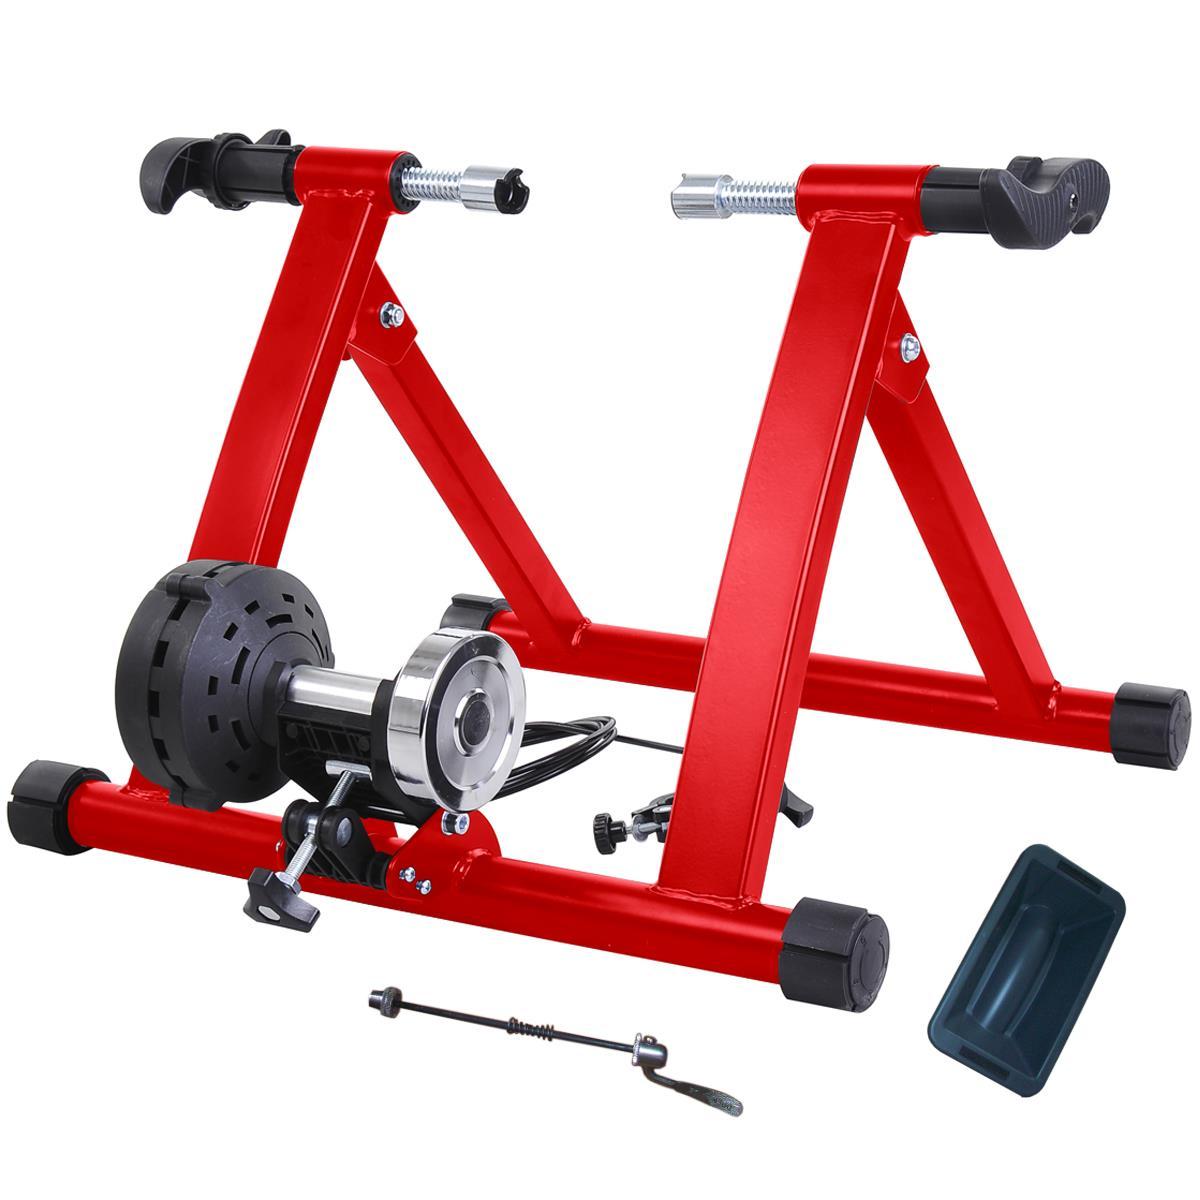 MAGNETIC 8 RESISTANCE LEVEL INDOOR BIKE TRAINER BICYCLE